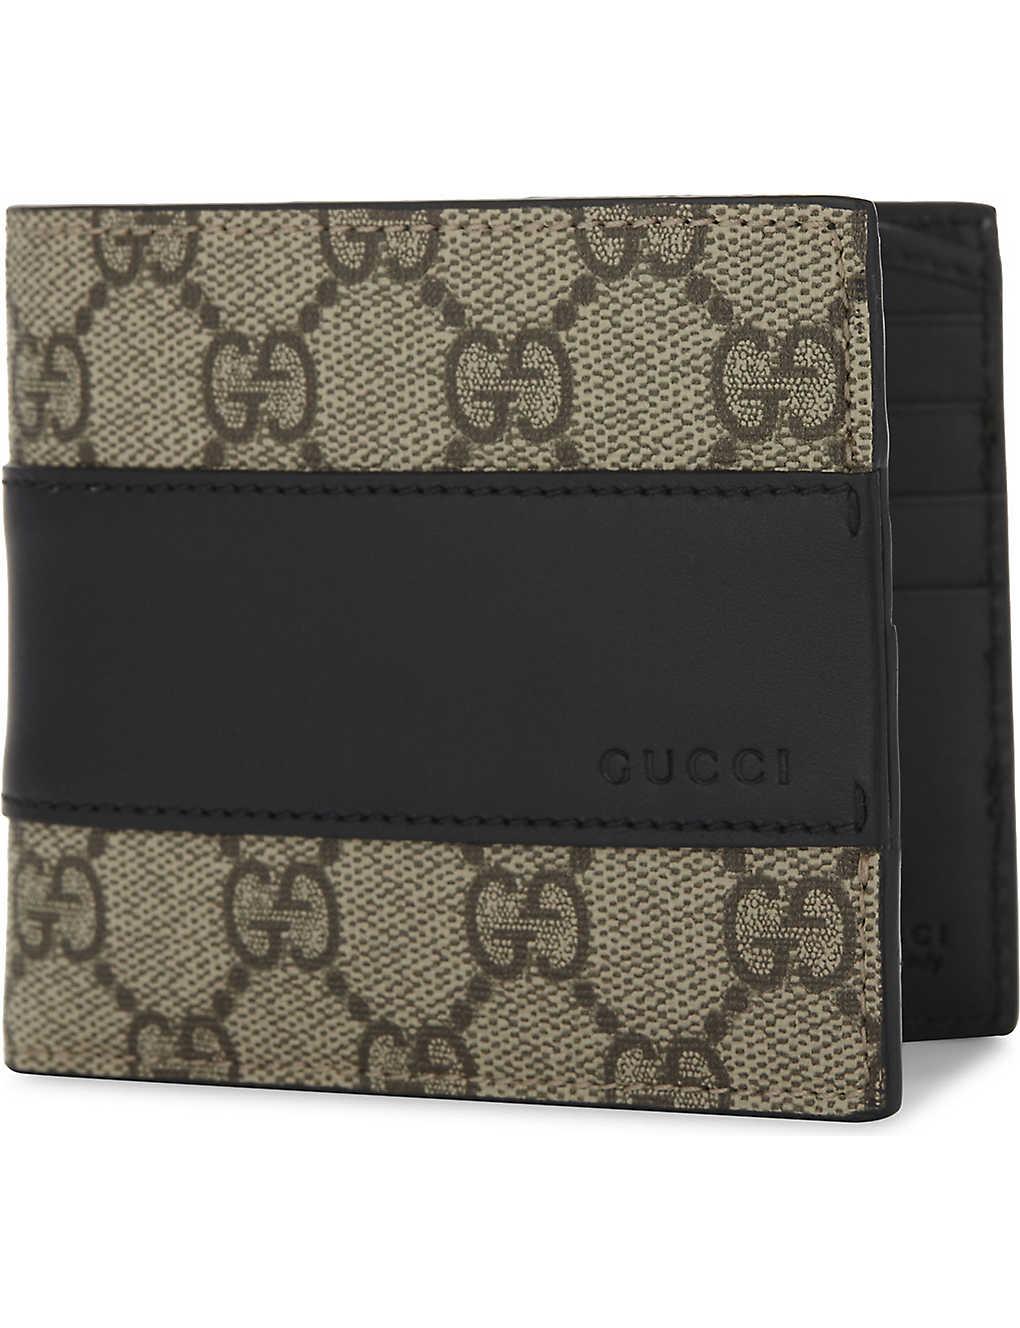 GUCCI - Wallets - Accessories - Mens - Selfridges   Shop Online